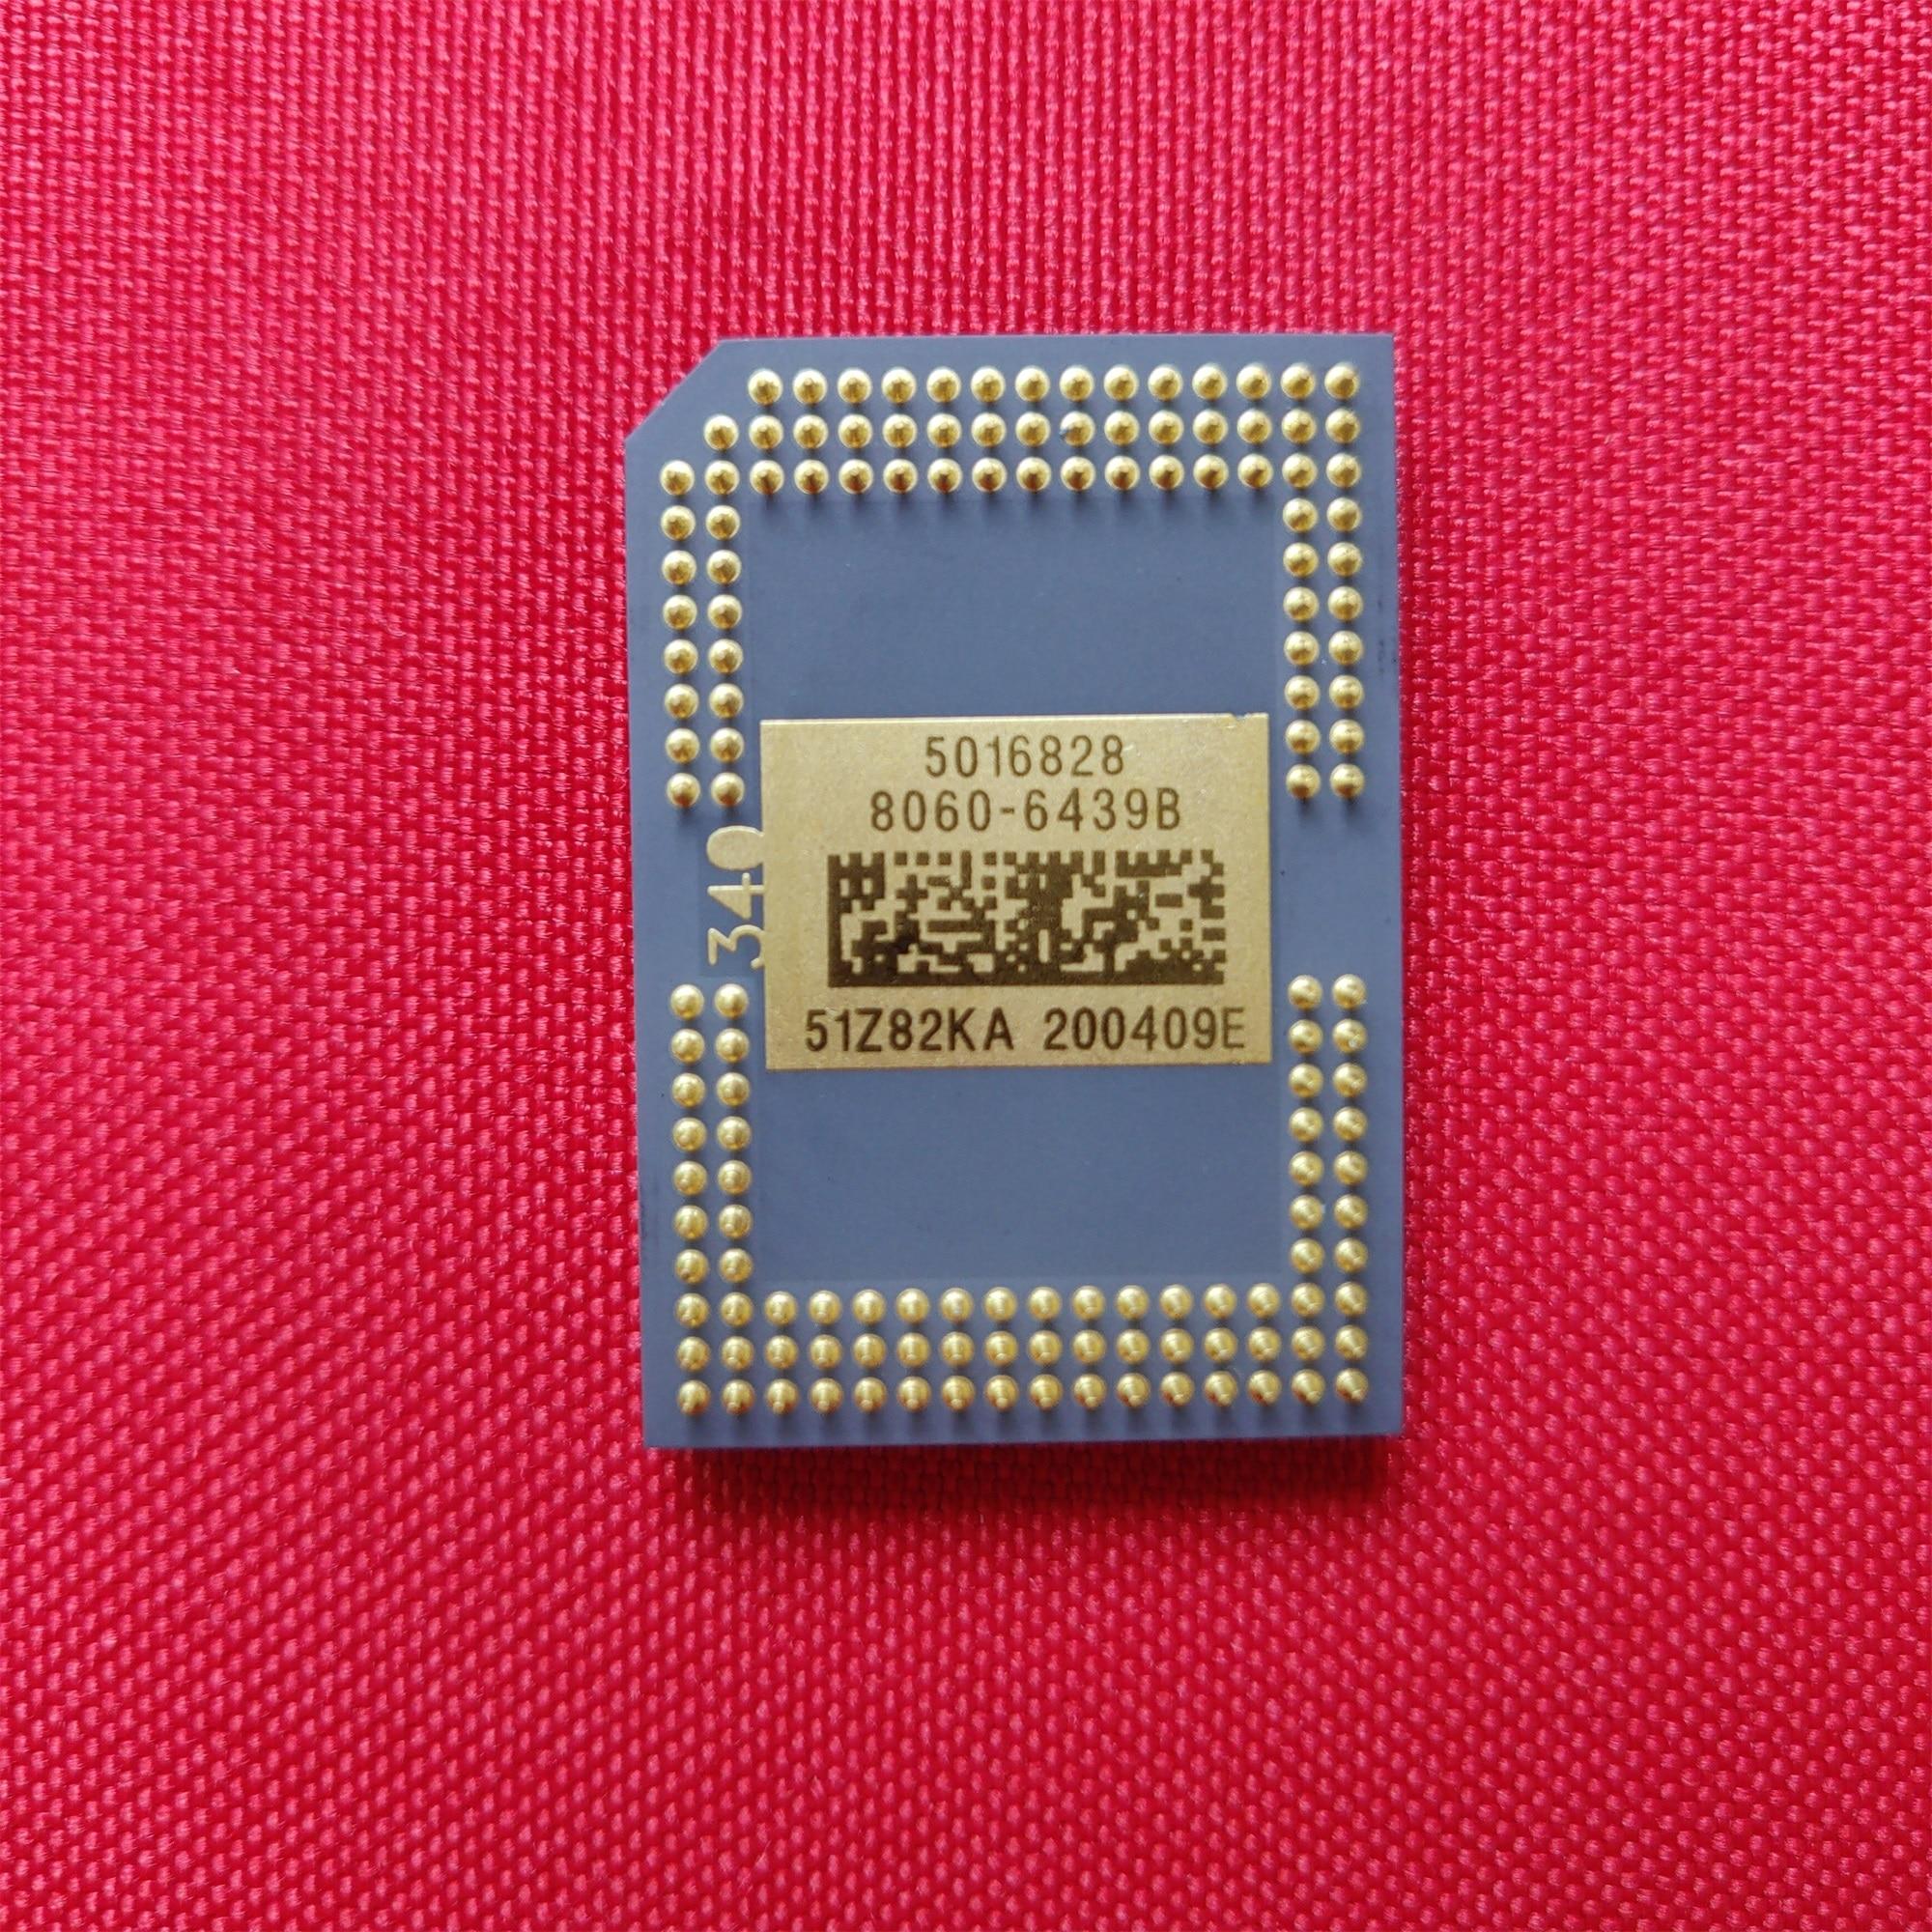 NEW Original Projector Dmd Chips 8060-6439B 8060-6438B 8060-6038B 8060-6138B 8060-6338B 8060-6339B For Benq MP515 / Benq MP515ST